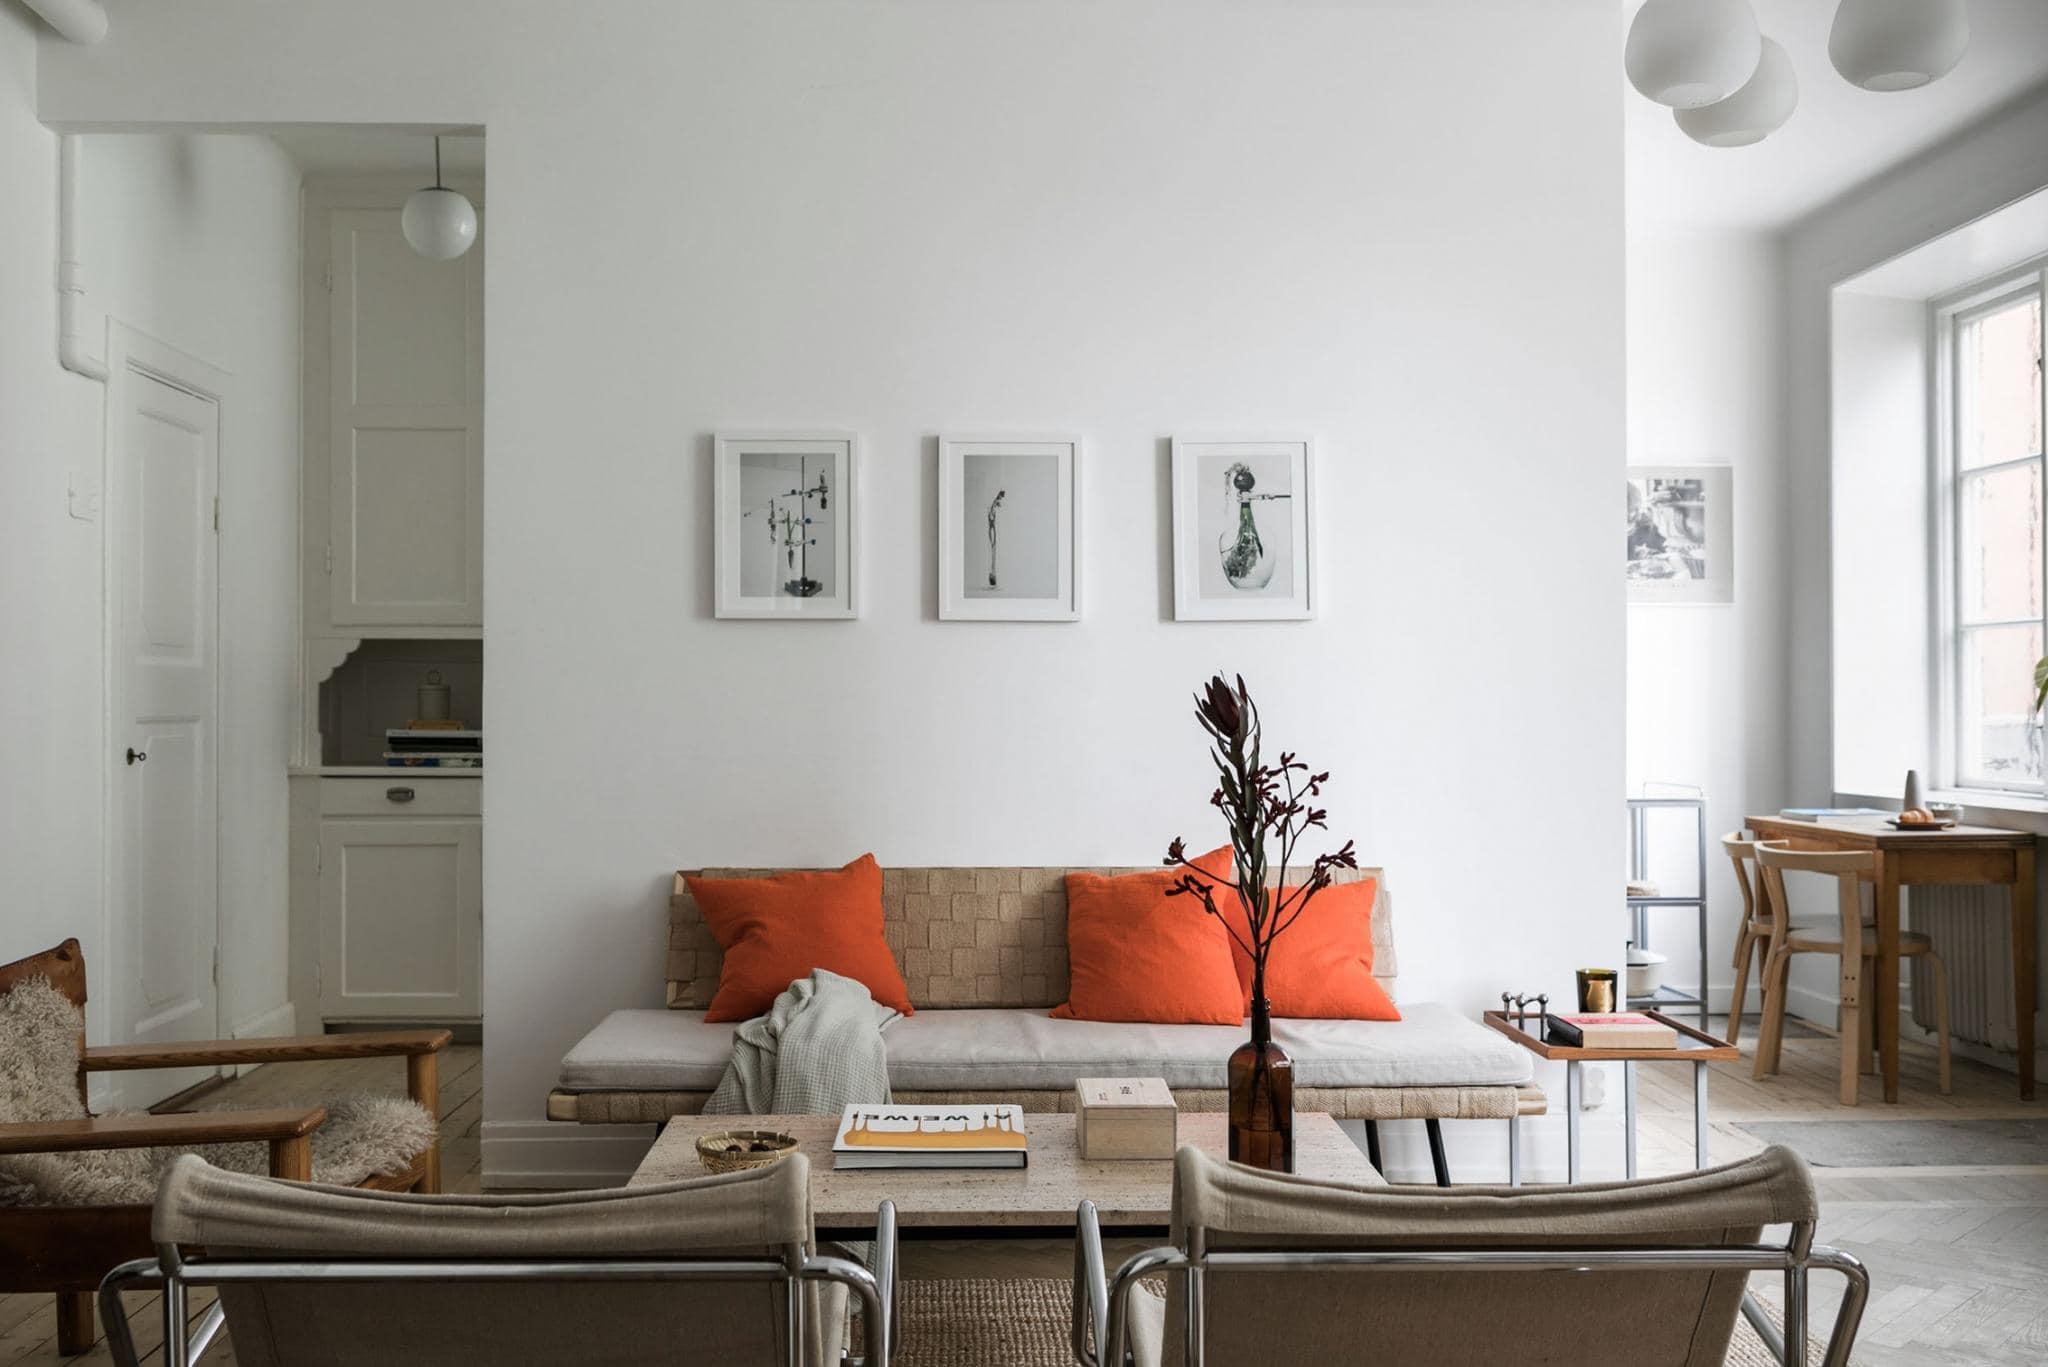 Separated kitchen and living room - COCO LAPINE DESIGNCOCO LAPINE DESIGN